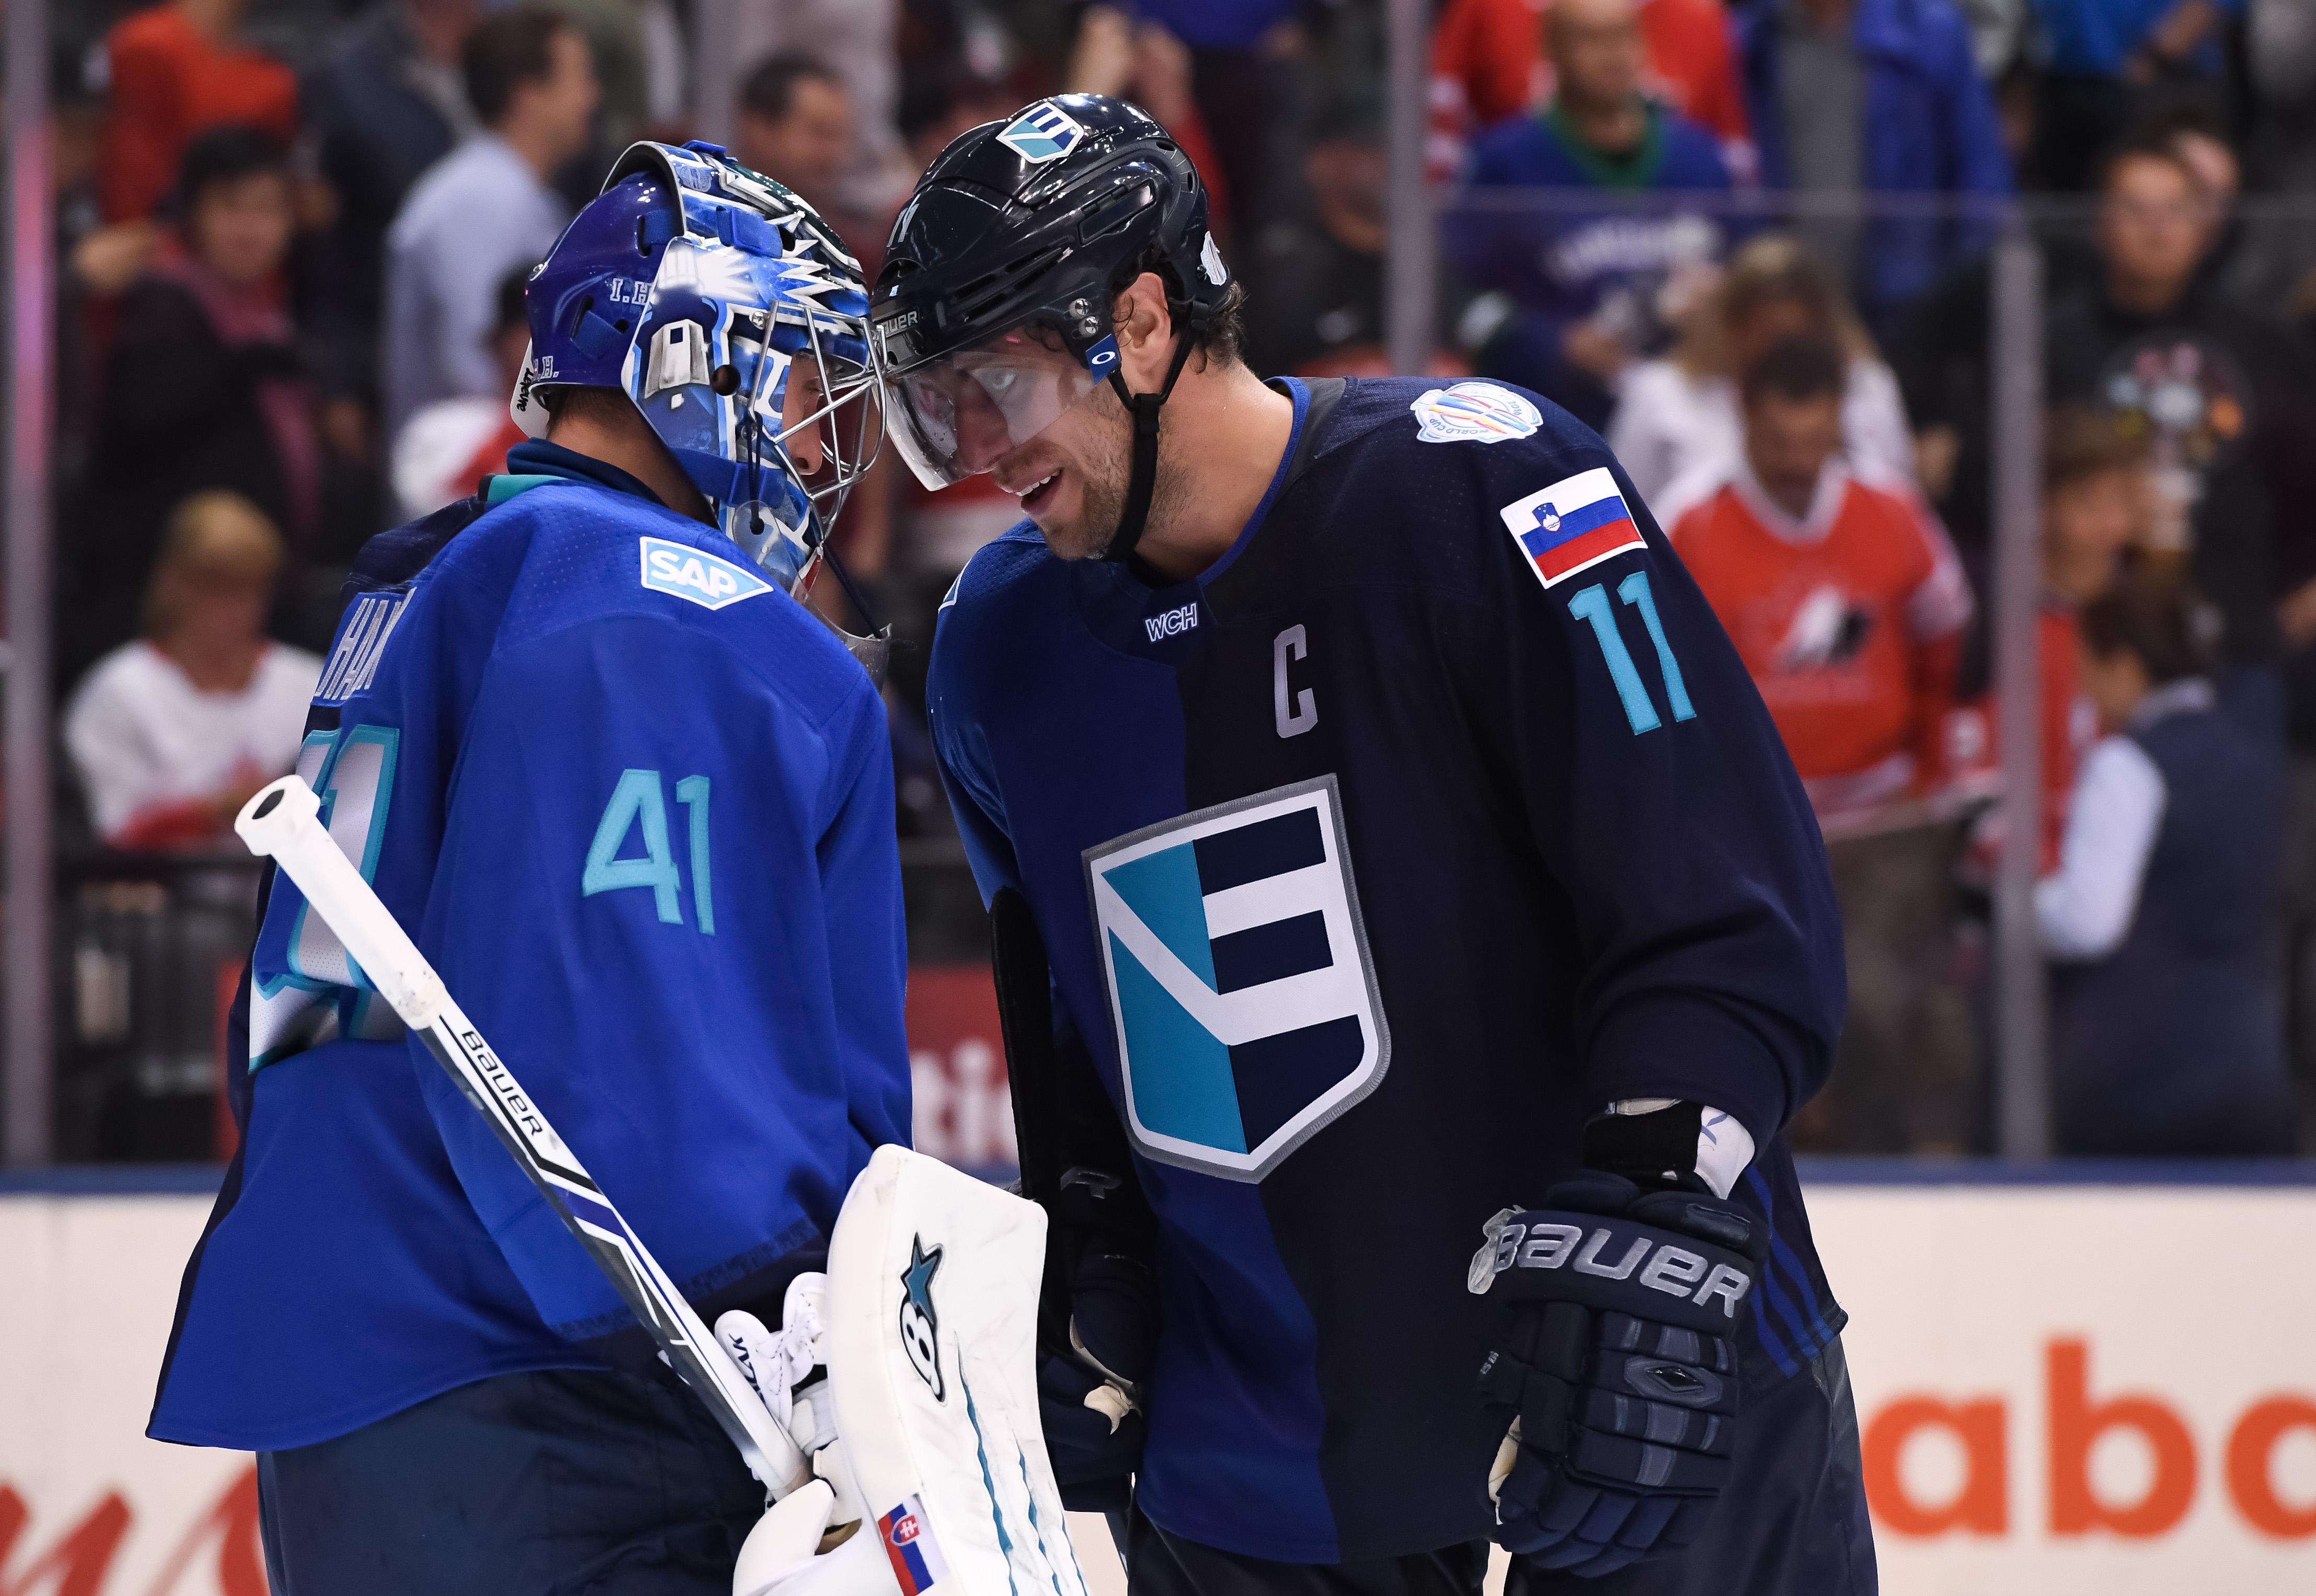 World Cup of Hockey  2016 - Team USA v Team Europe